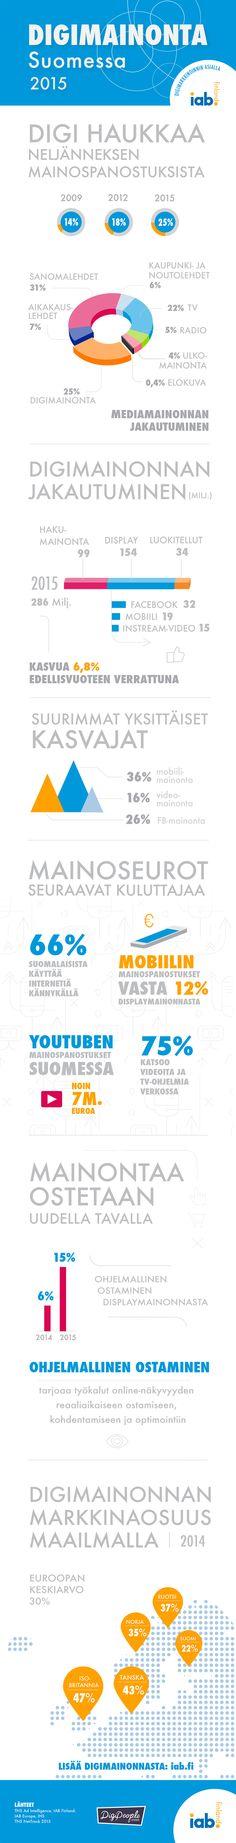 Infograafi: Digimainonta Suomessa 2015